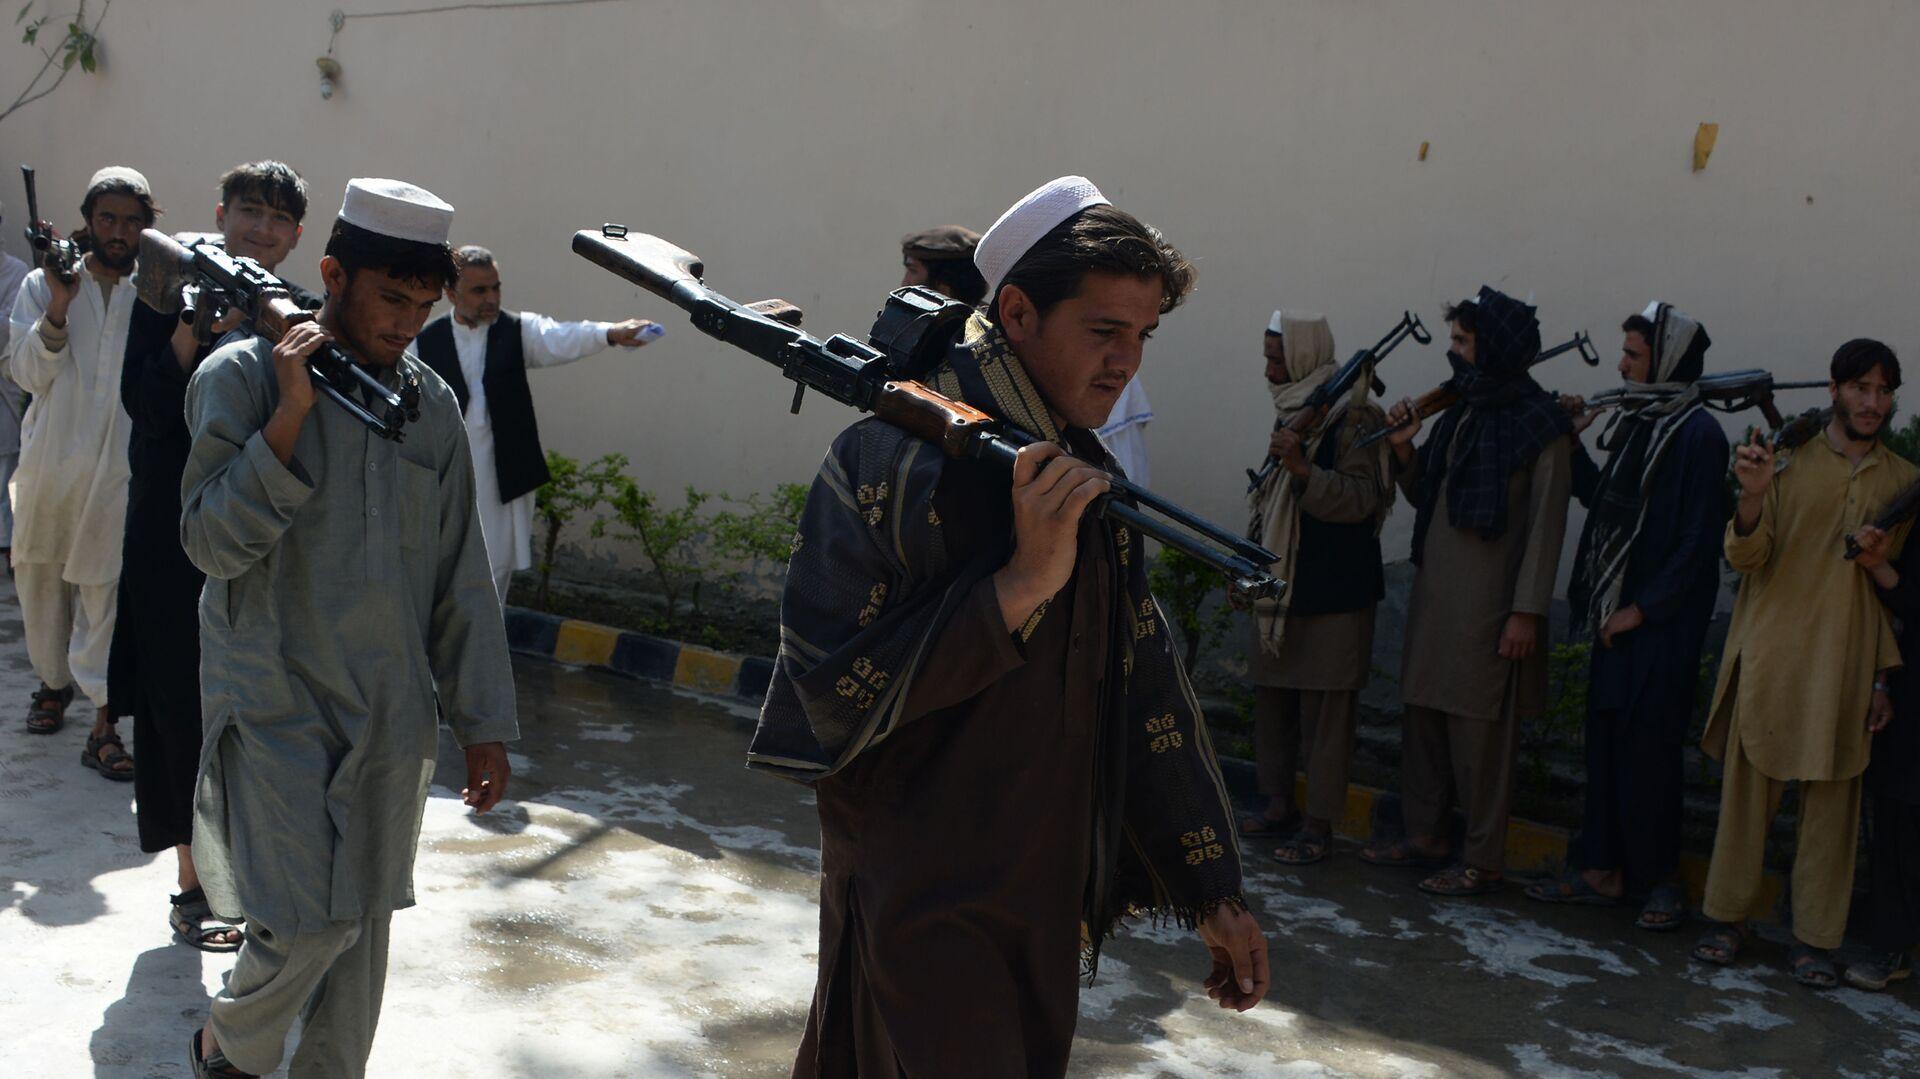 Talibanes afganos (archivo) - Sputnik Mundo, 1920, 30.06.2021